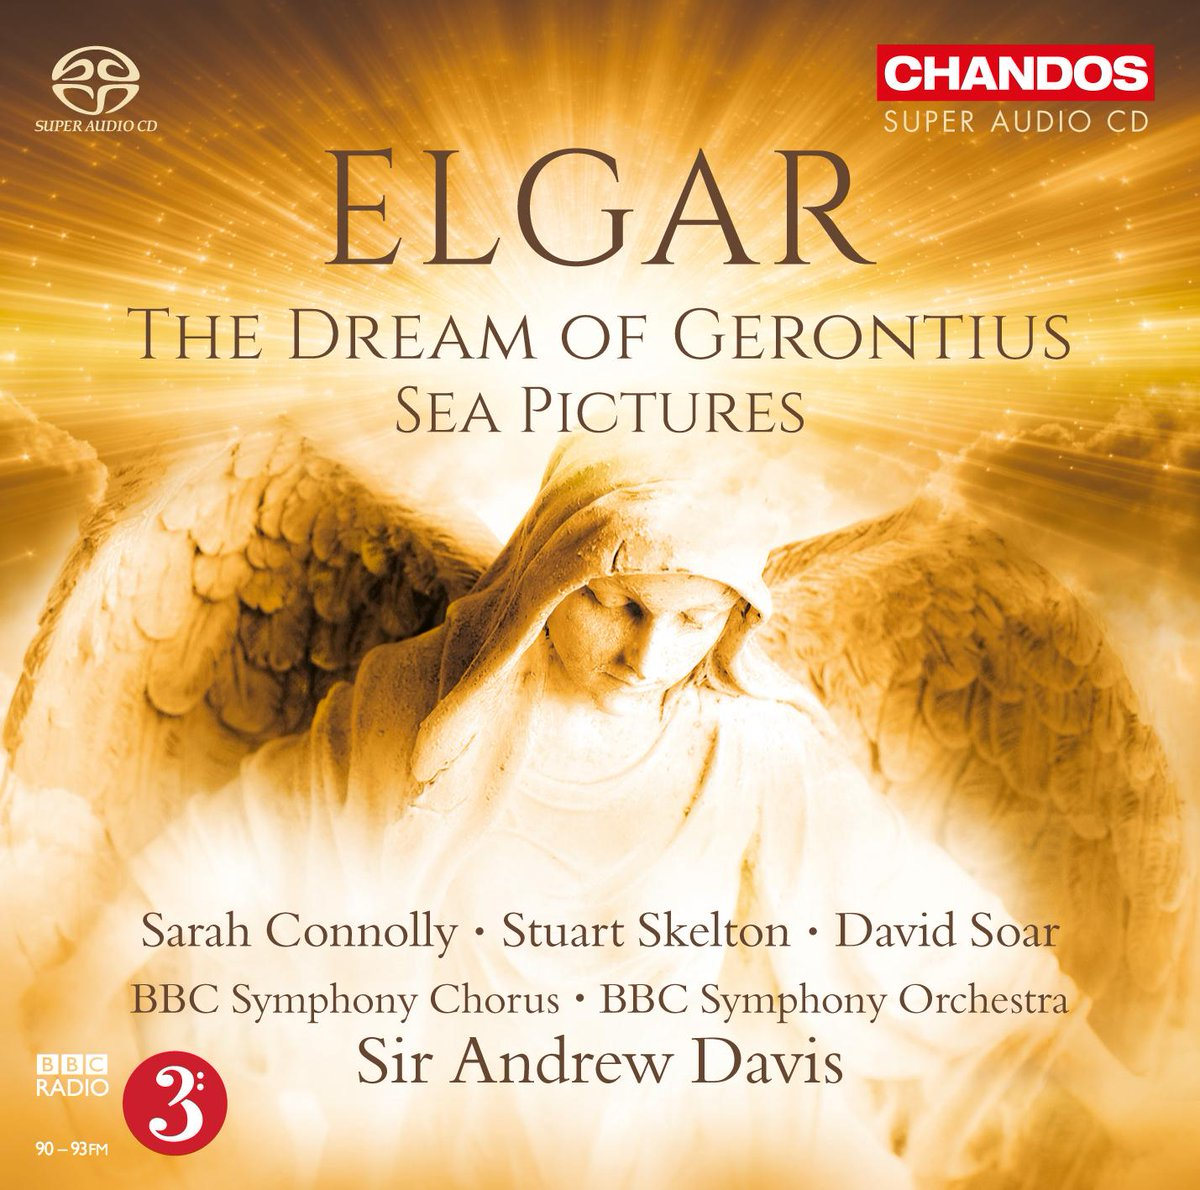 CONGRATS! Choral Winner #GramoAwards @spconnolly @StuartSkelton @dsoar76 @BBCSO - Listen/Order http://t.co/y57oJYEf7y http://t.co/hRjkzhQTGw